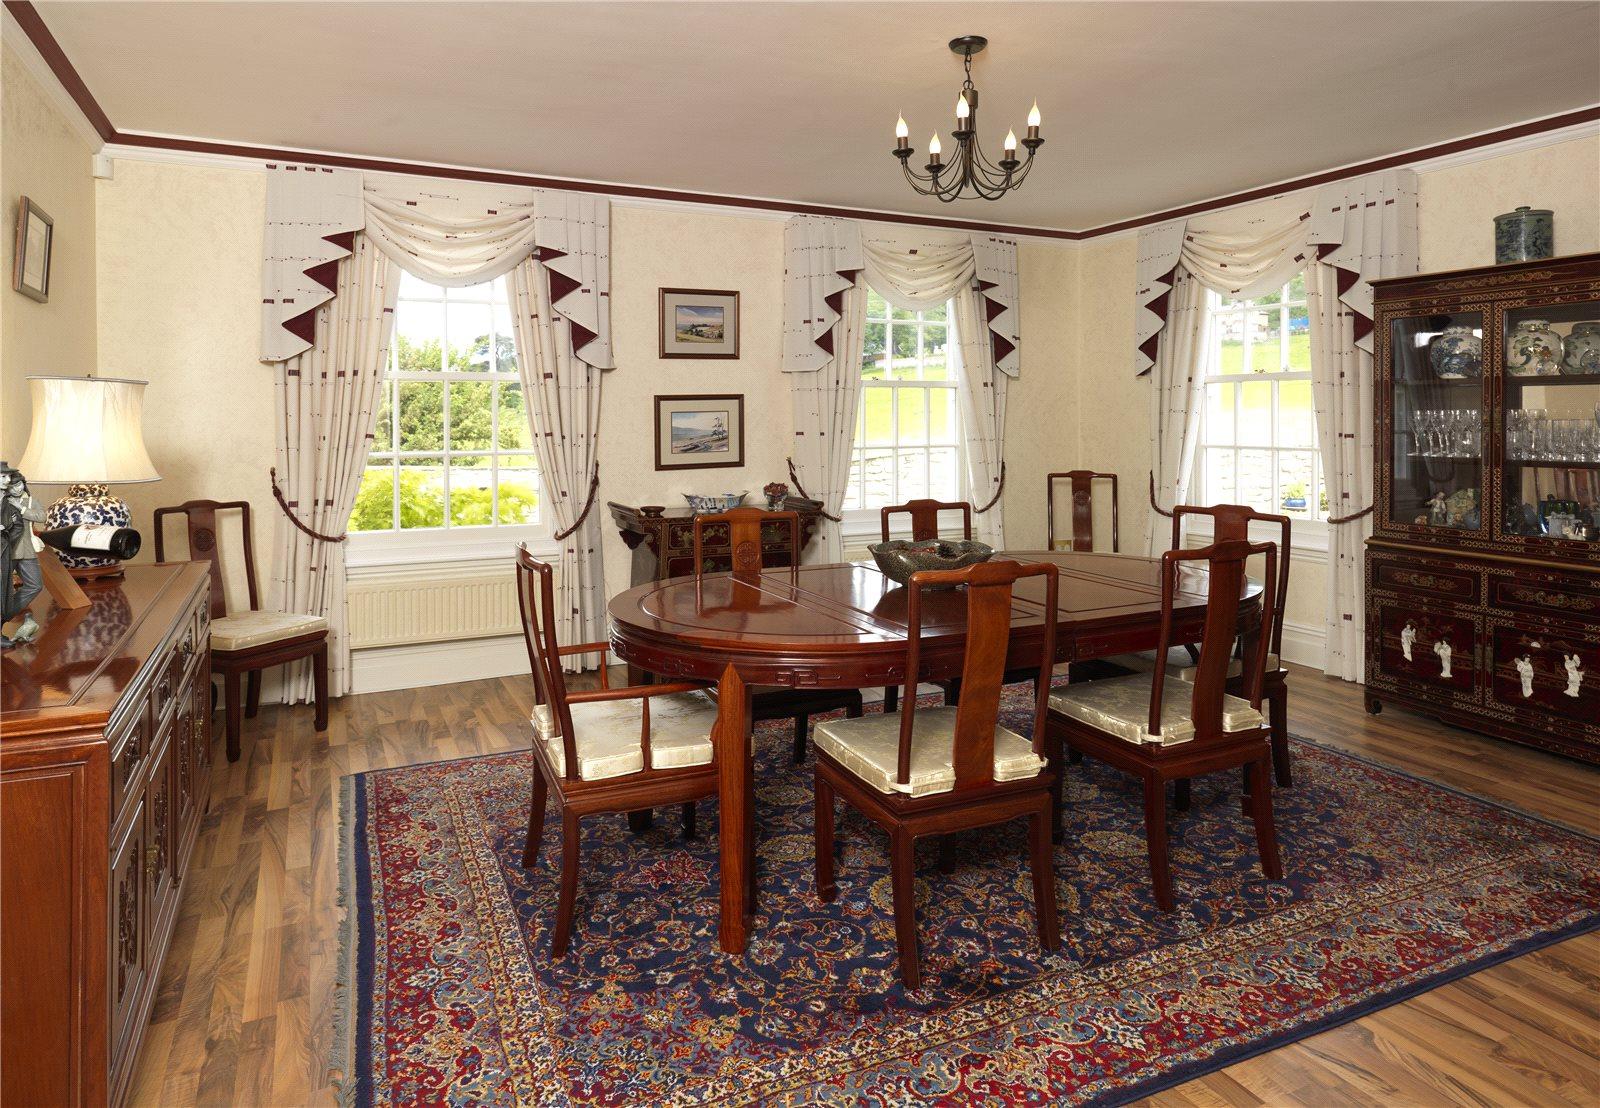 Additional photo for property listing at Holywell Road, Rhuallt, St. Asaph, Denbighshire, LL17 Denbighshire, Wales